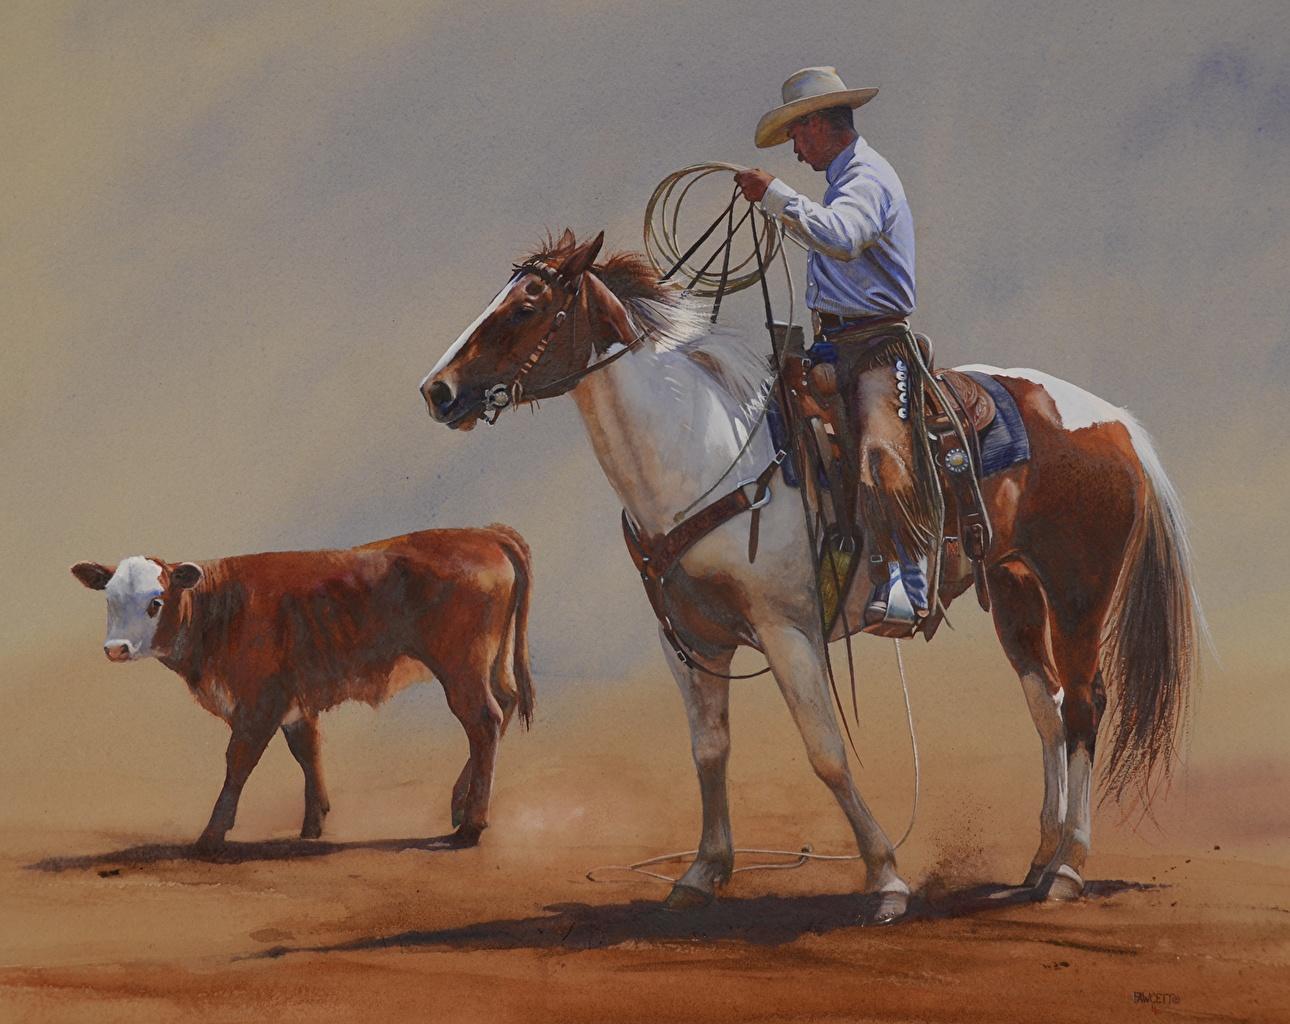 Desktop Wallpapers Horses Cowboy John Fawcett Sixty Feet Of Rope